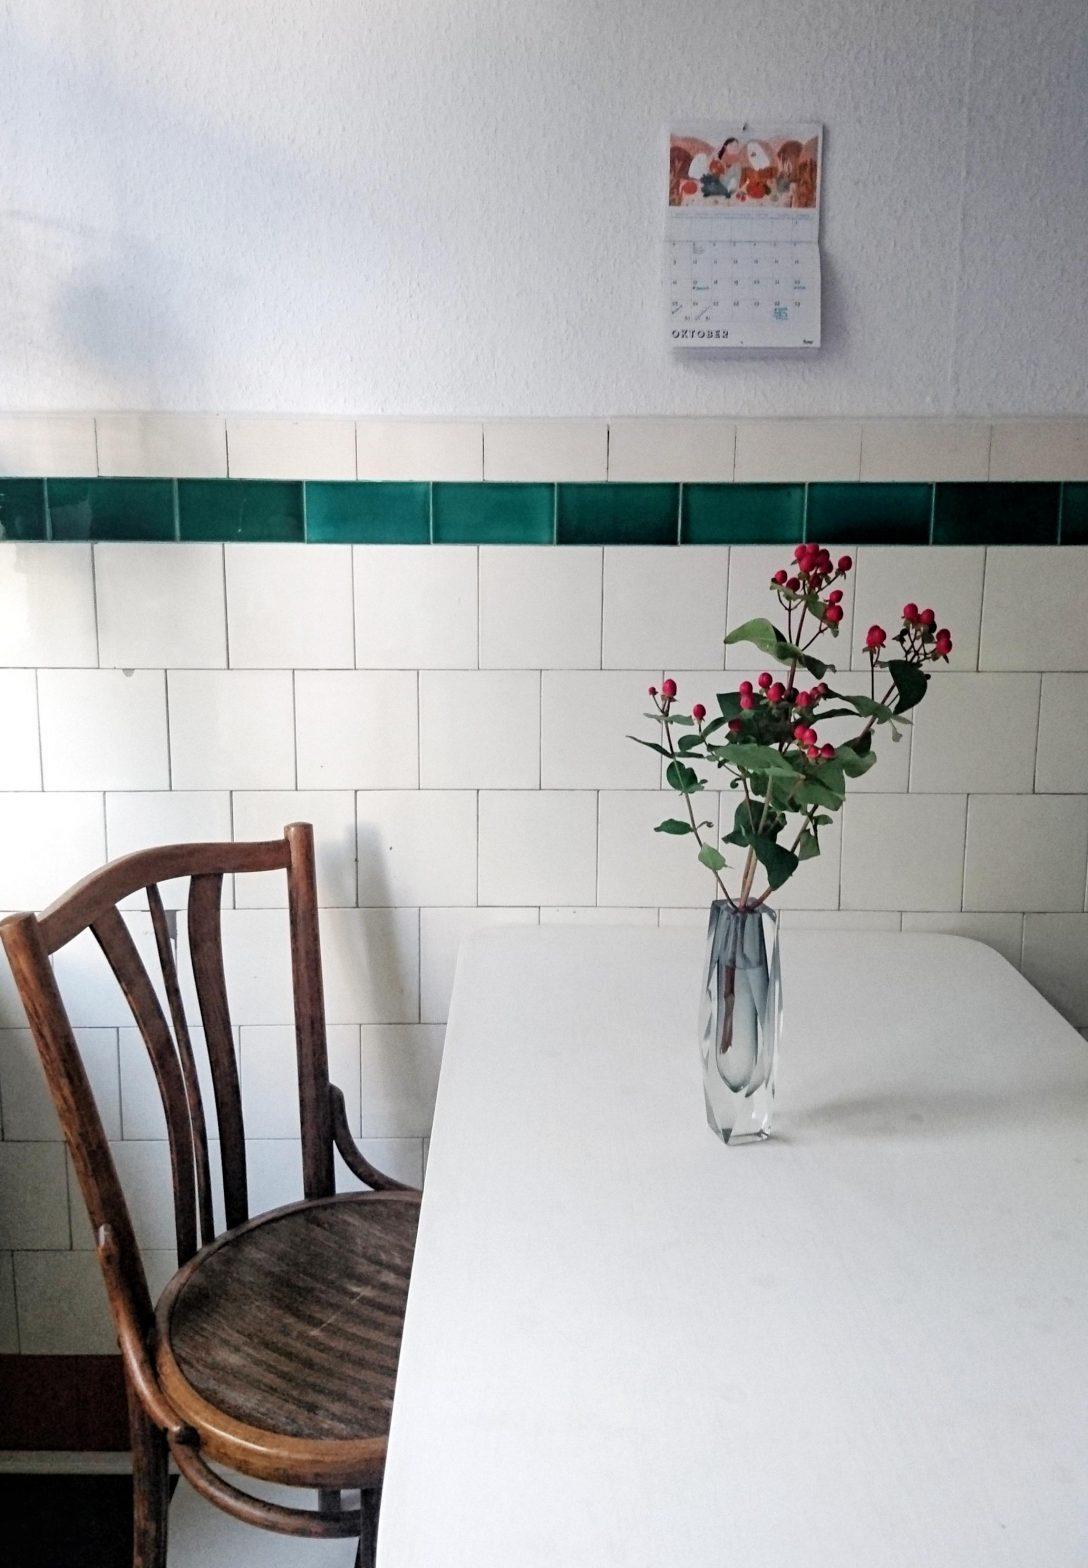 Large Size of Küche Fliesenspiegel Aufkleber Küche Fliesenspiegel Streichen Küche Fliesenspiegel Alternative Küche Fliesenspiegel Retro Küche Küche Fliesenspiegel